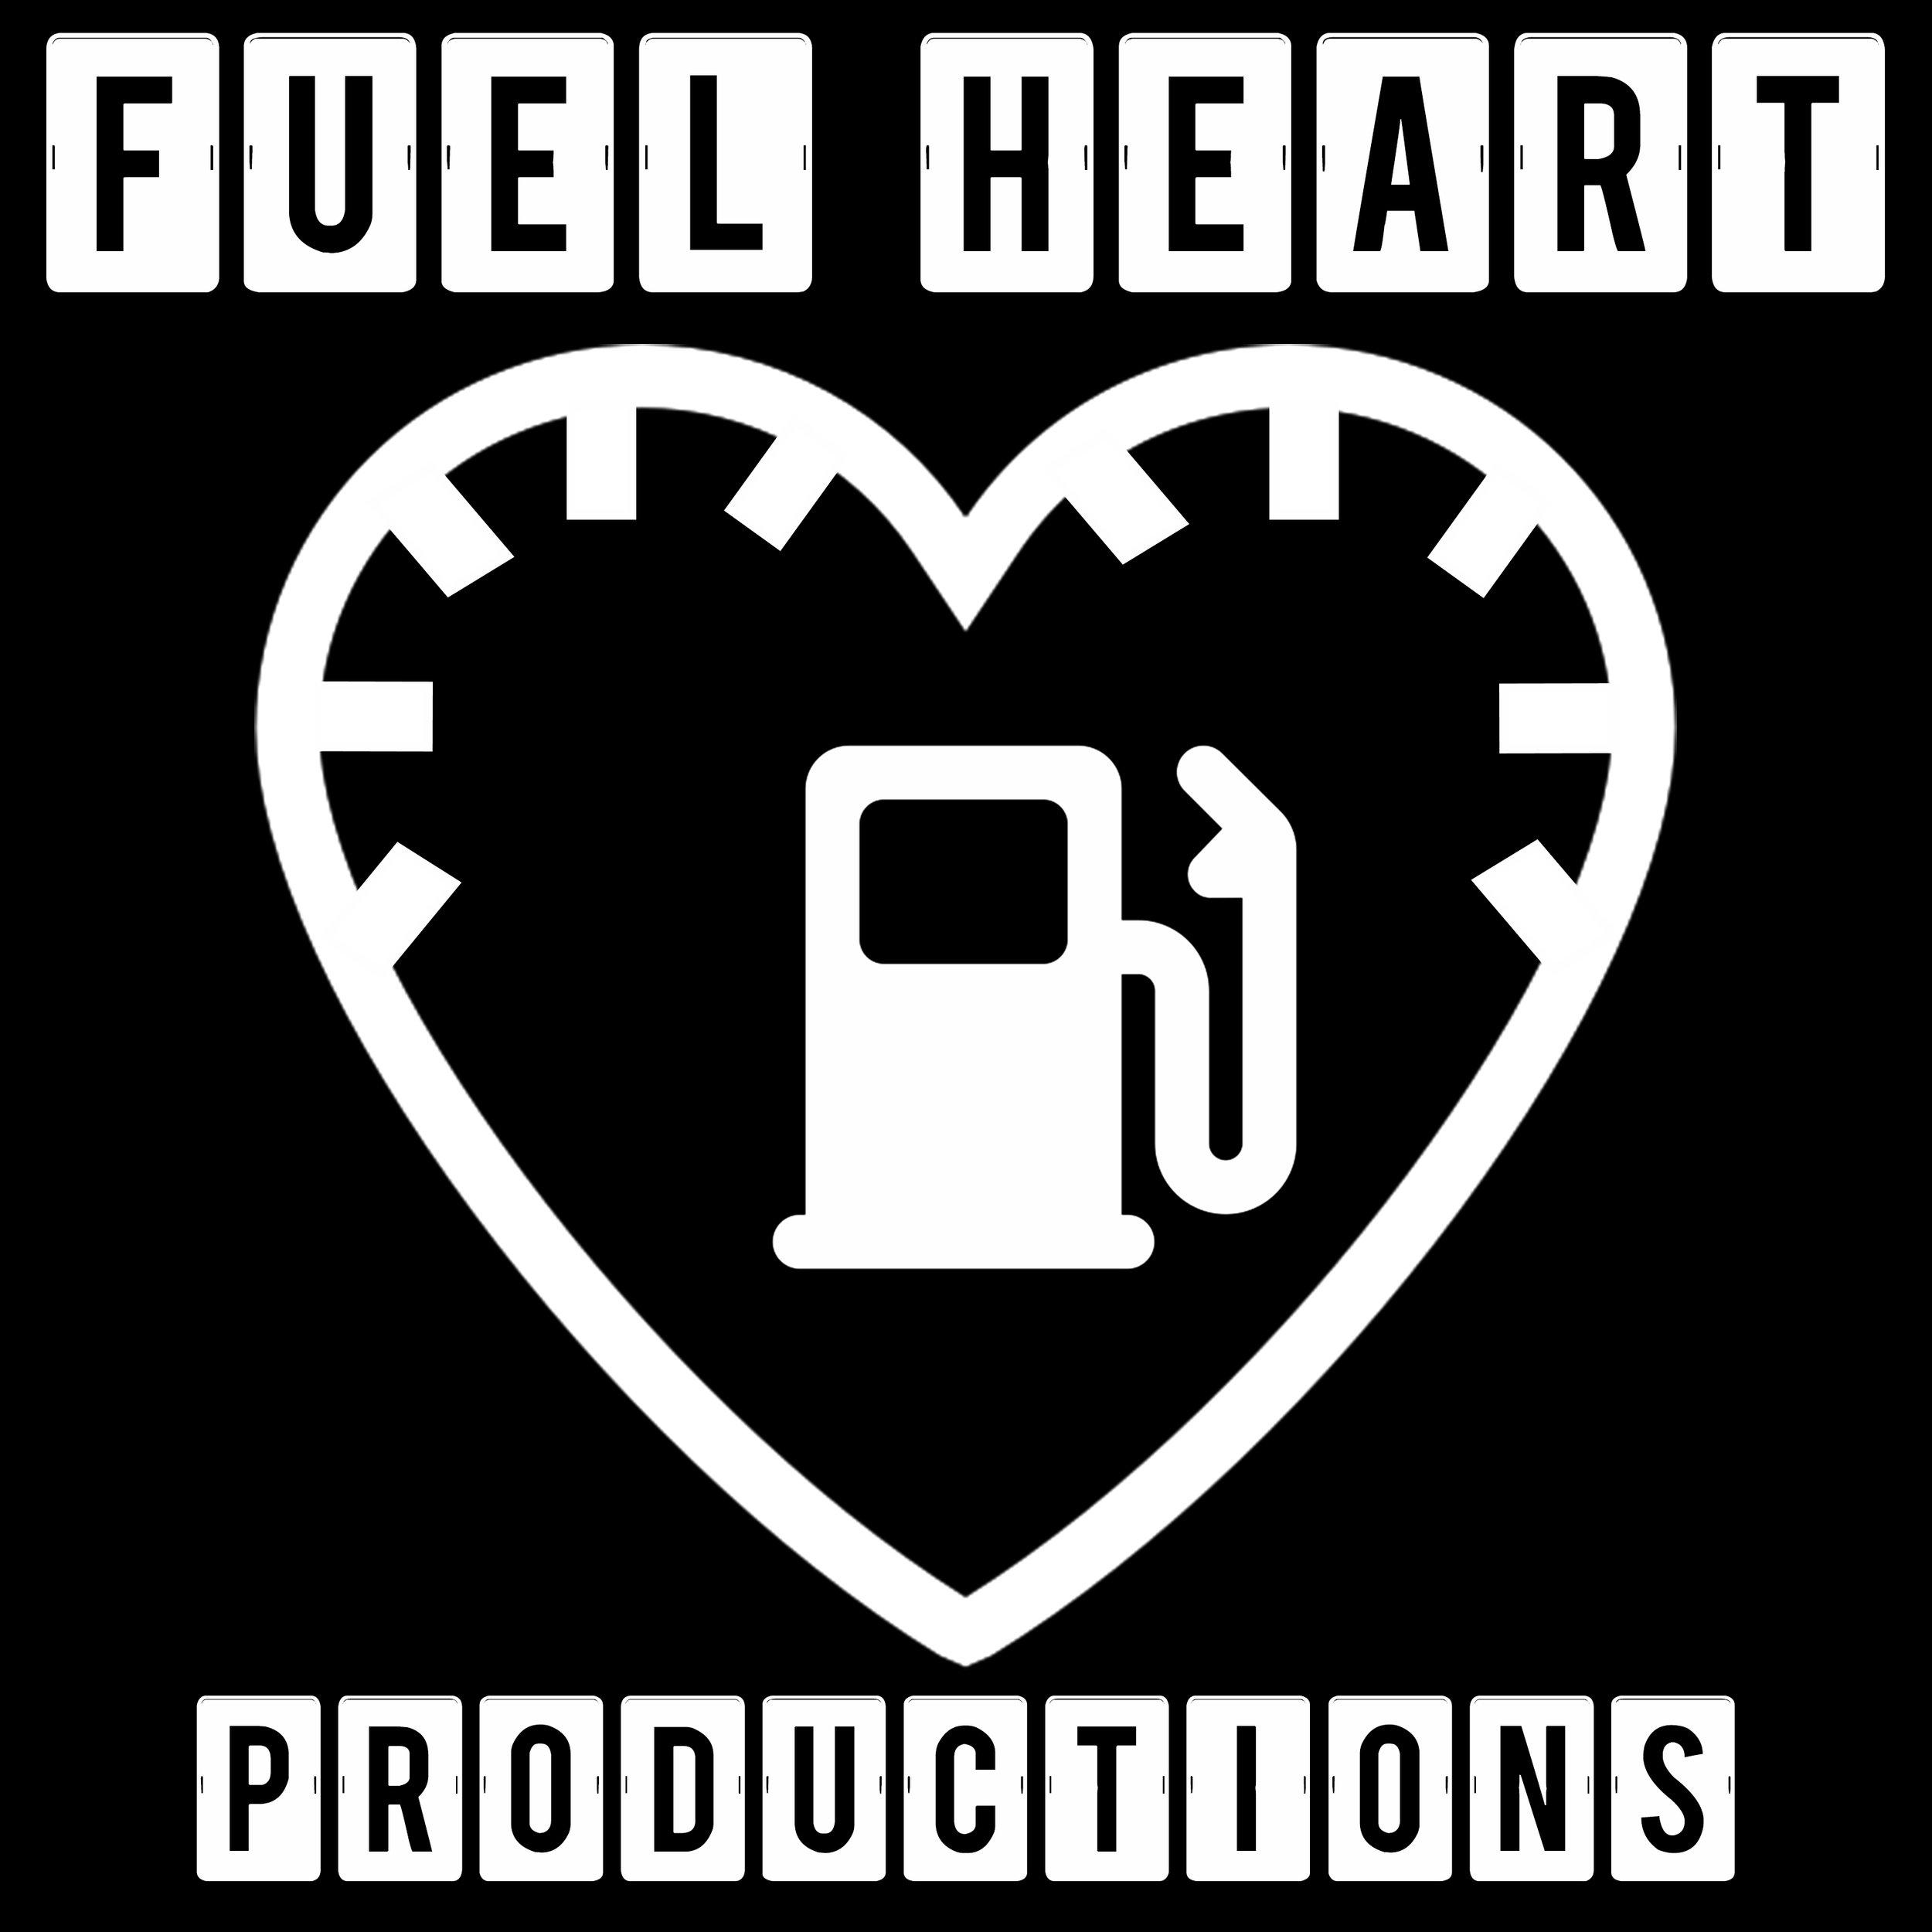 fuelnewoct.jpg